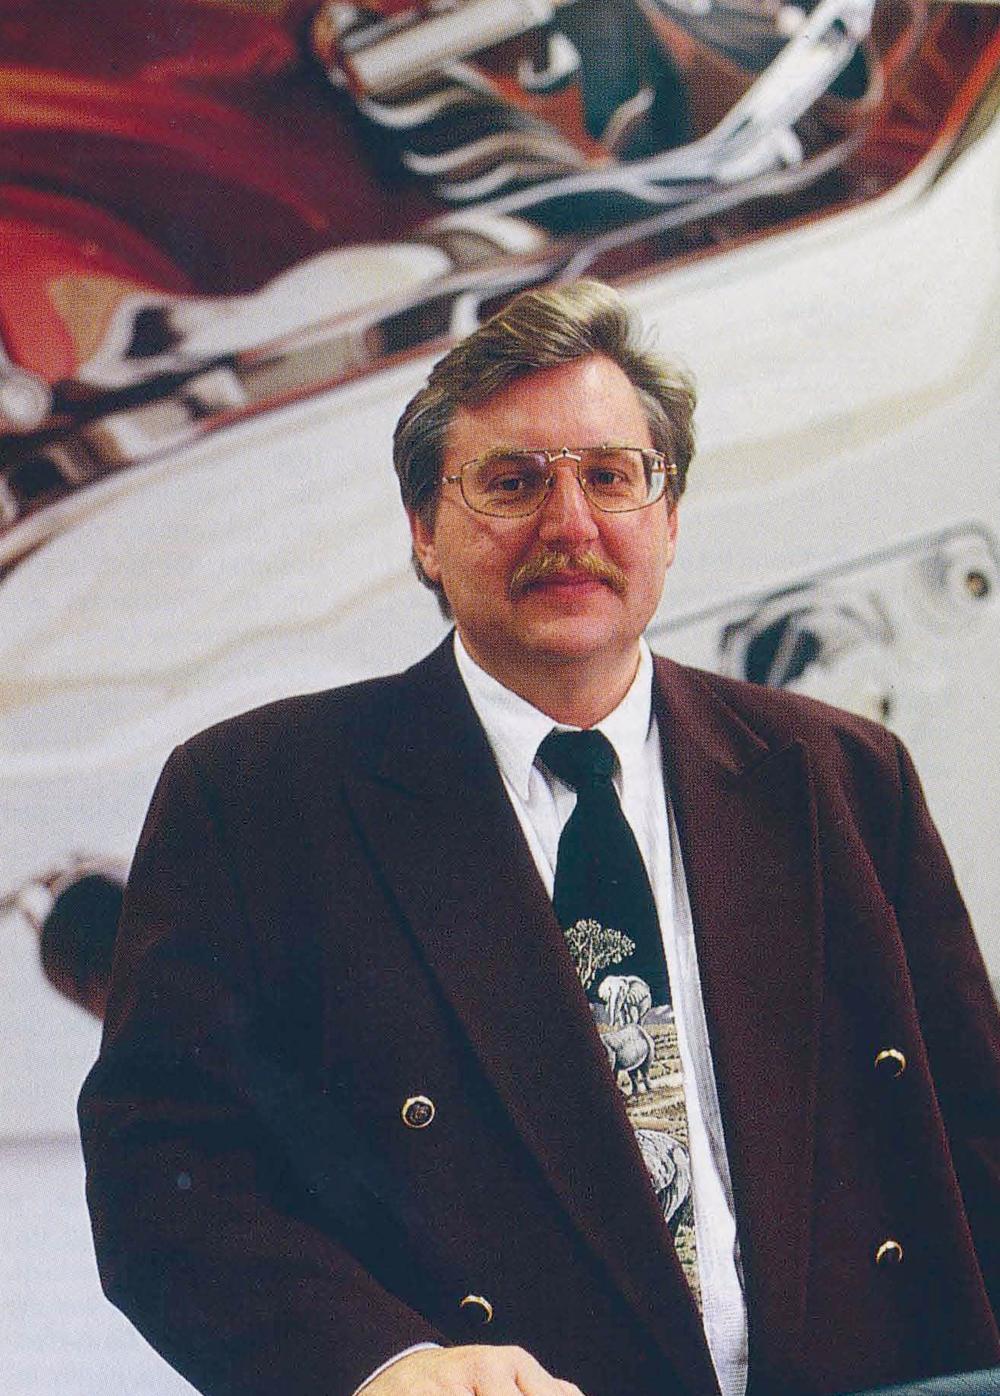 Eberhard Schöneburg